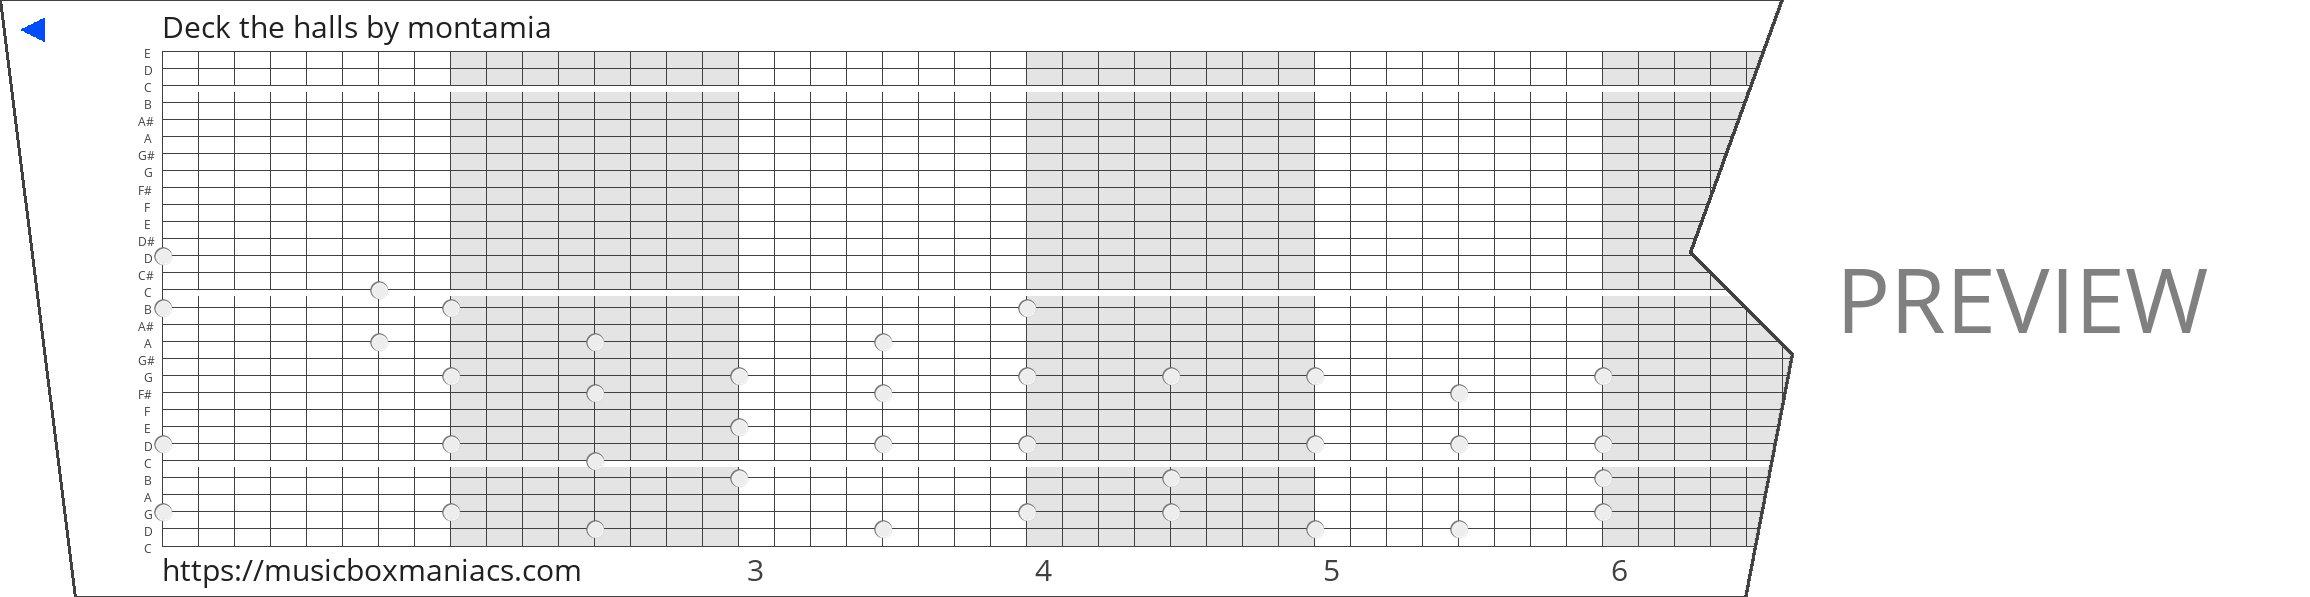 Deck the halls 30 note music box paper strip